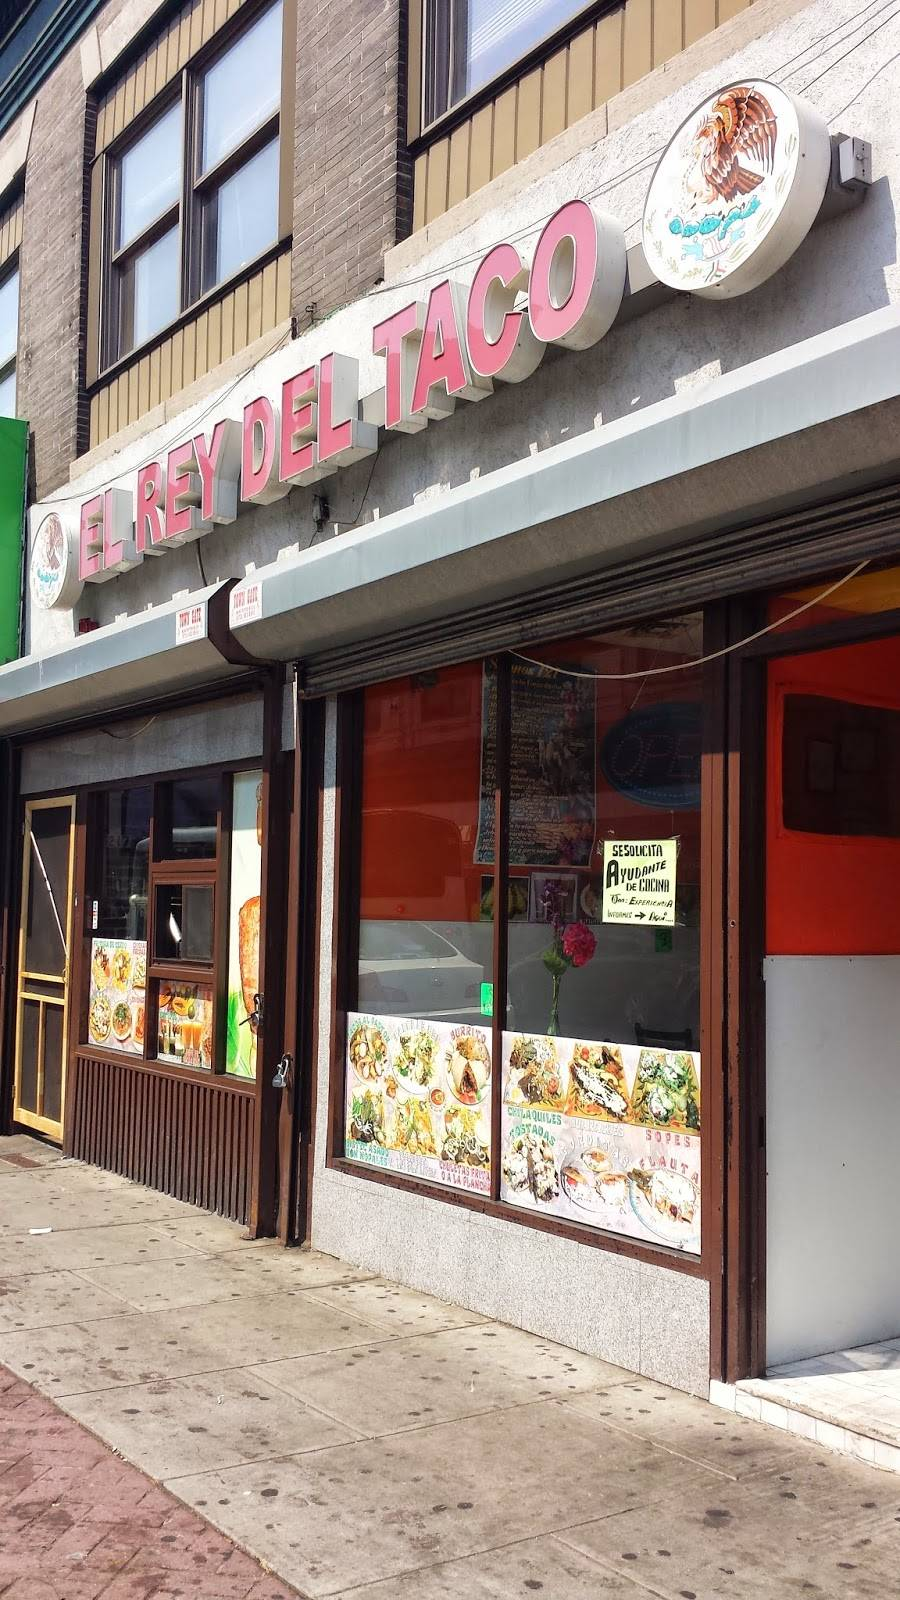 El Rey Del Taco | restaurant | 3217 Bergenline Ave, Union City, NJ 07087, USA | 2018631481 OR +1 201-863-1481